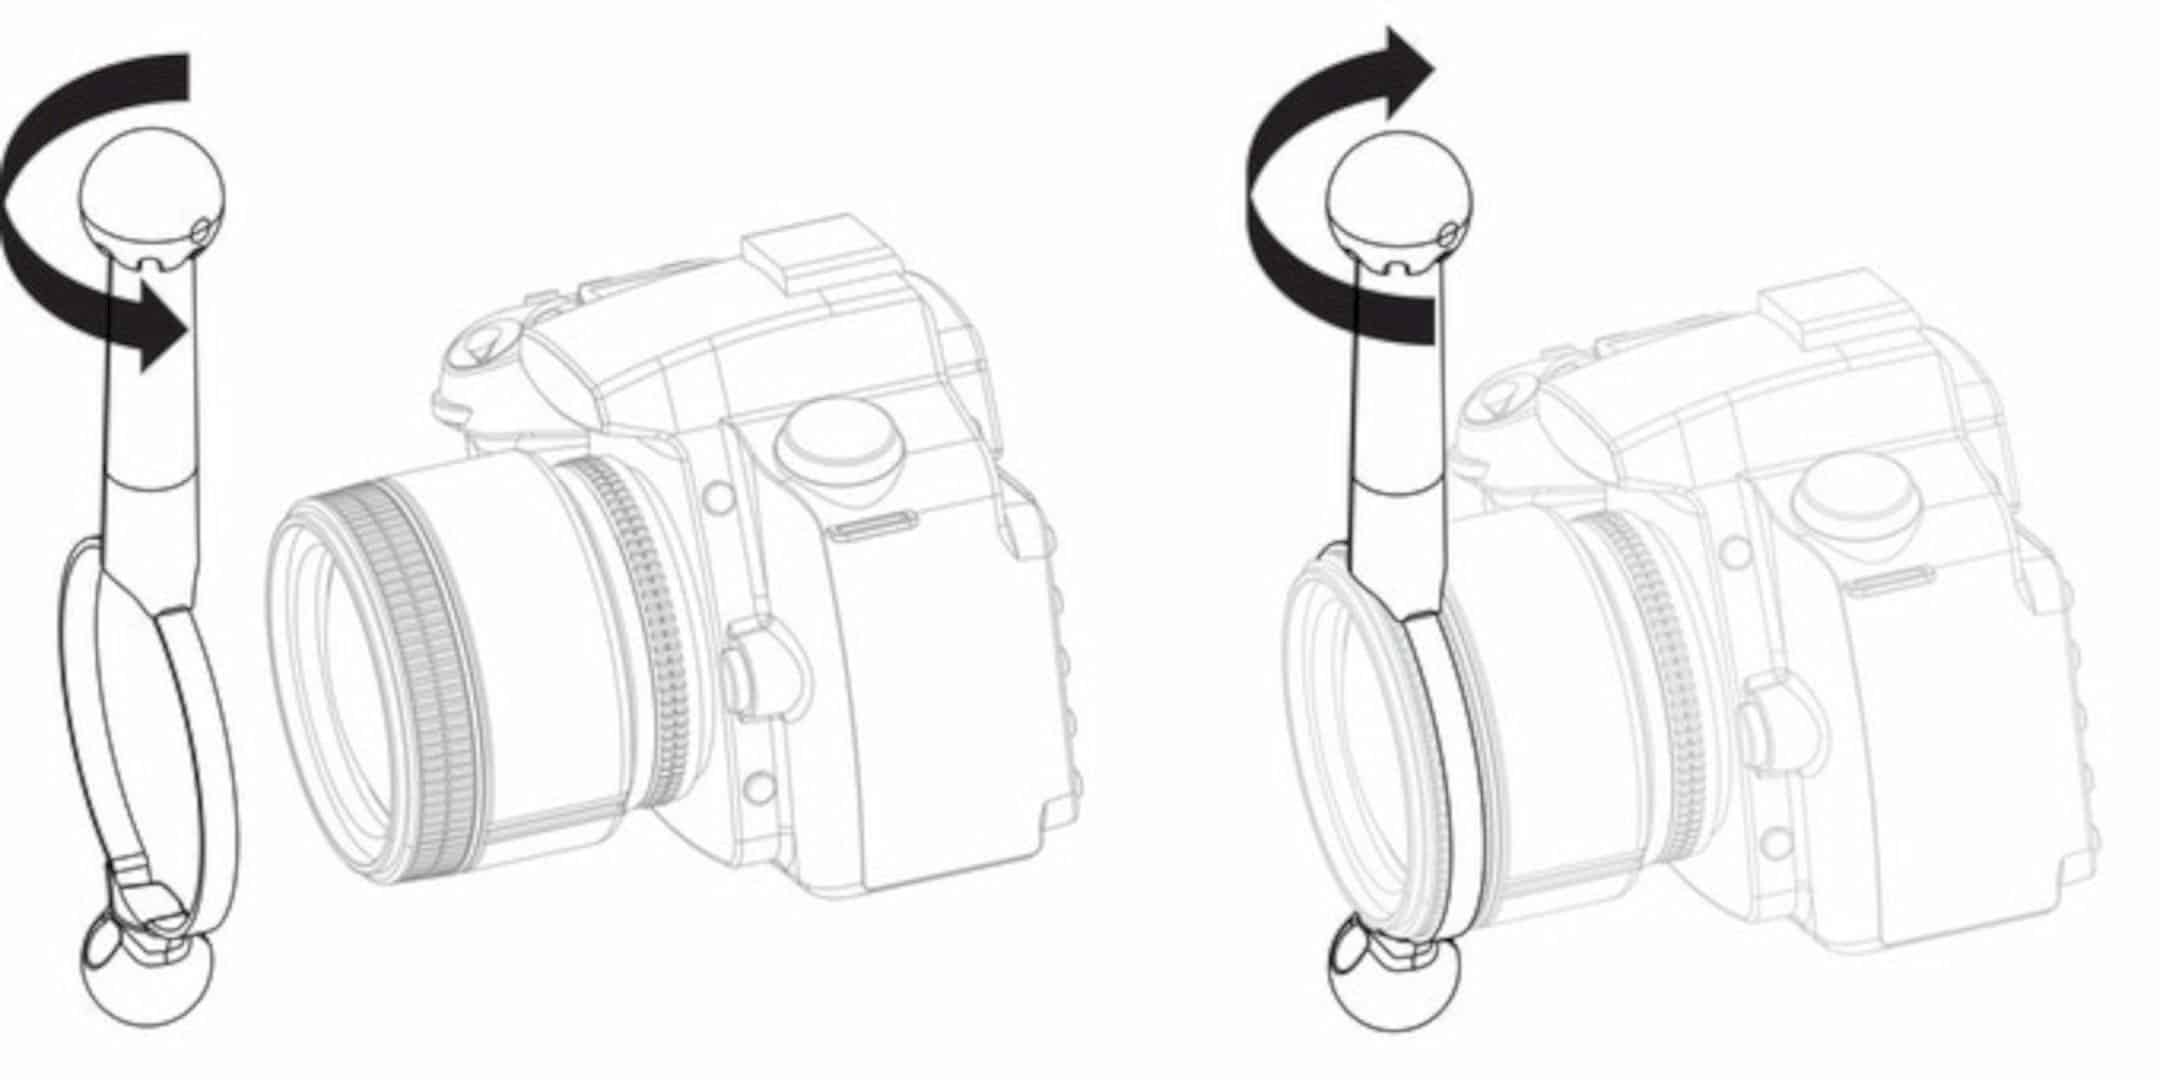 Lensshifter The Only Balanced Focus Zoom Camera Lens Grip